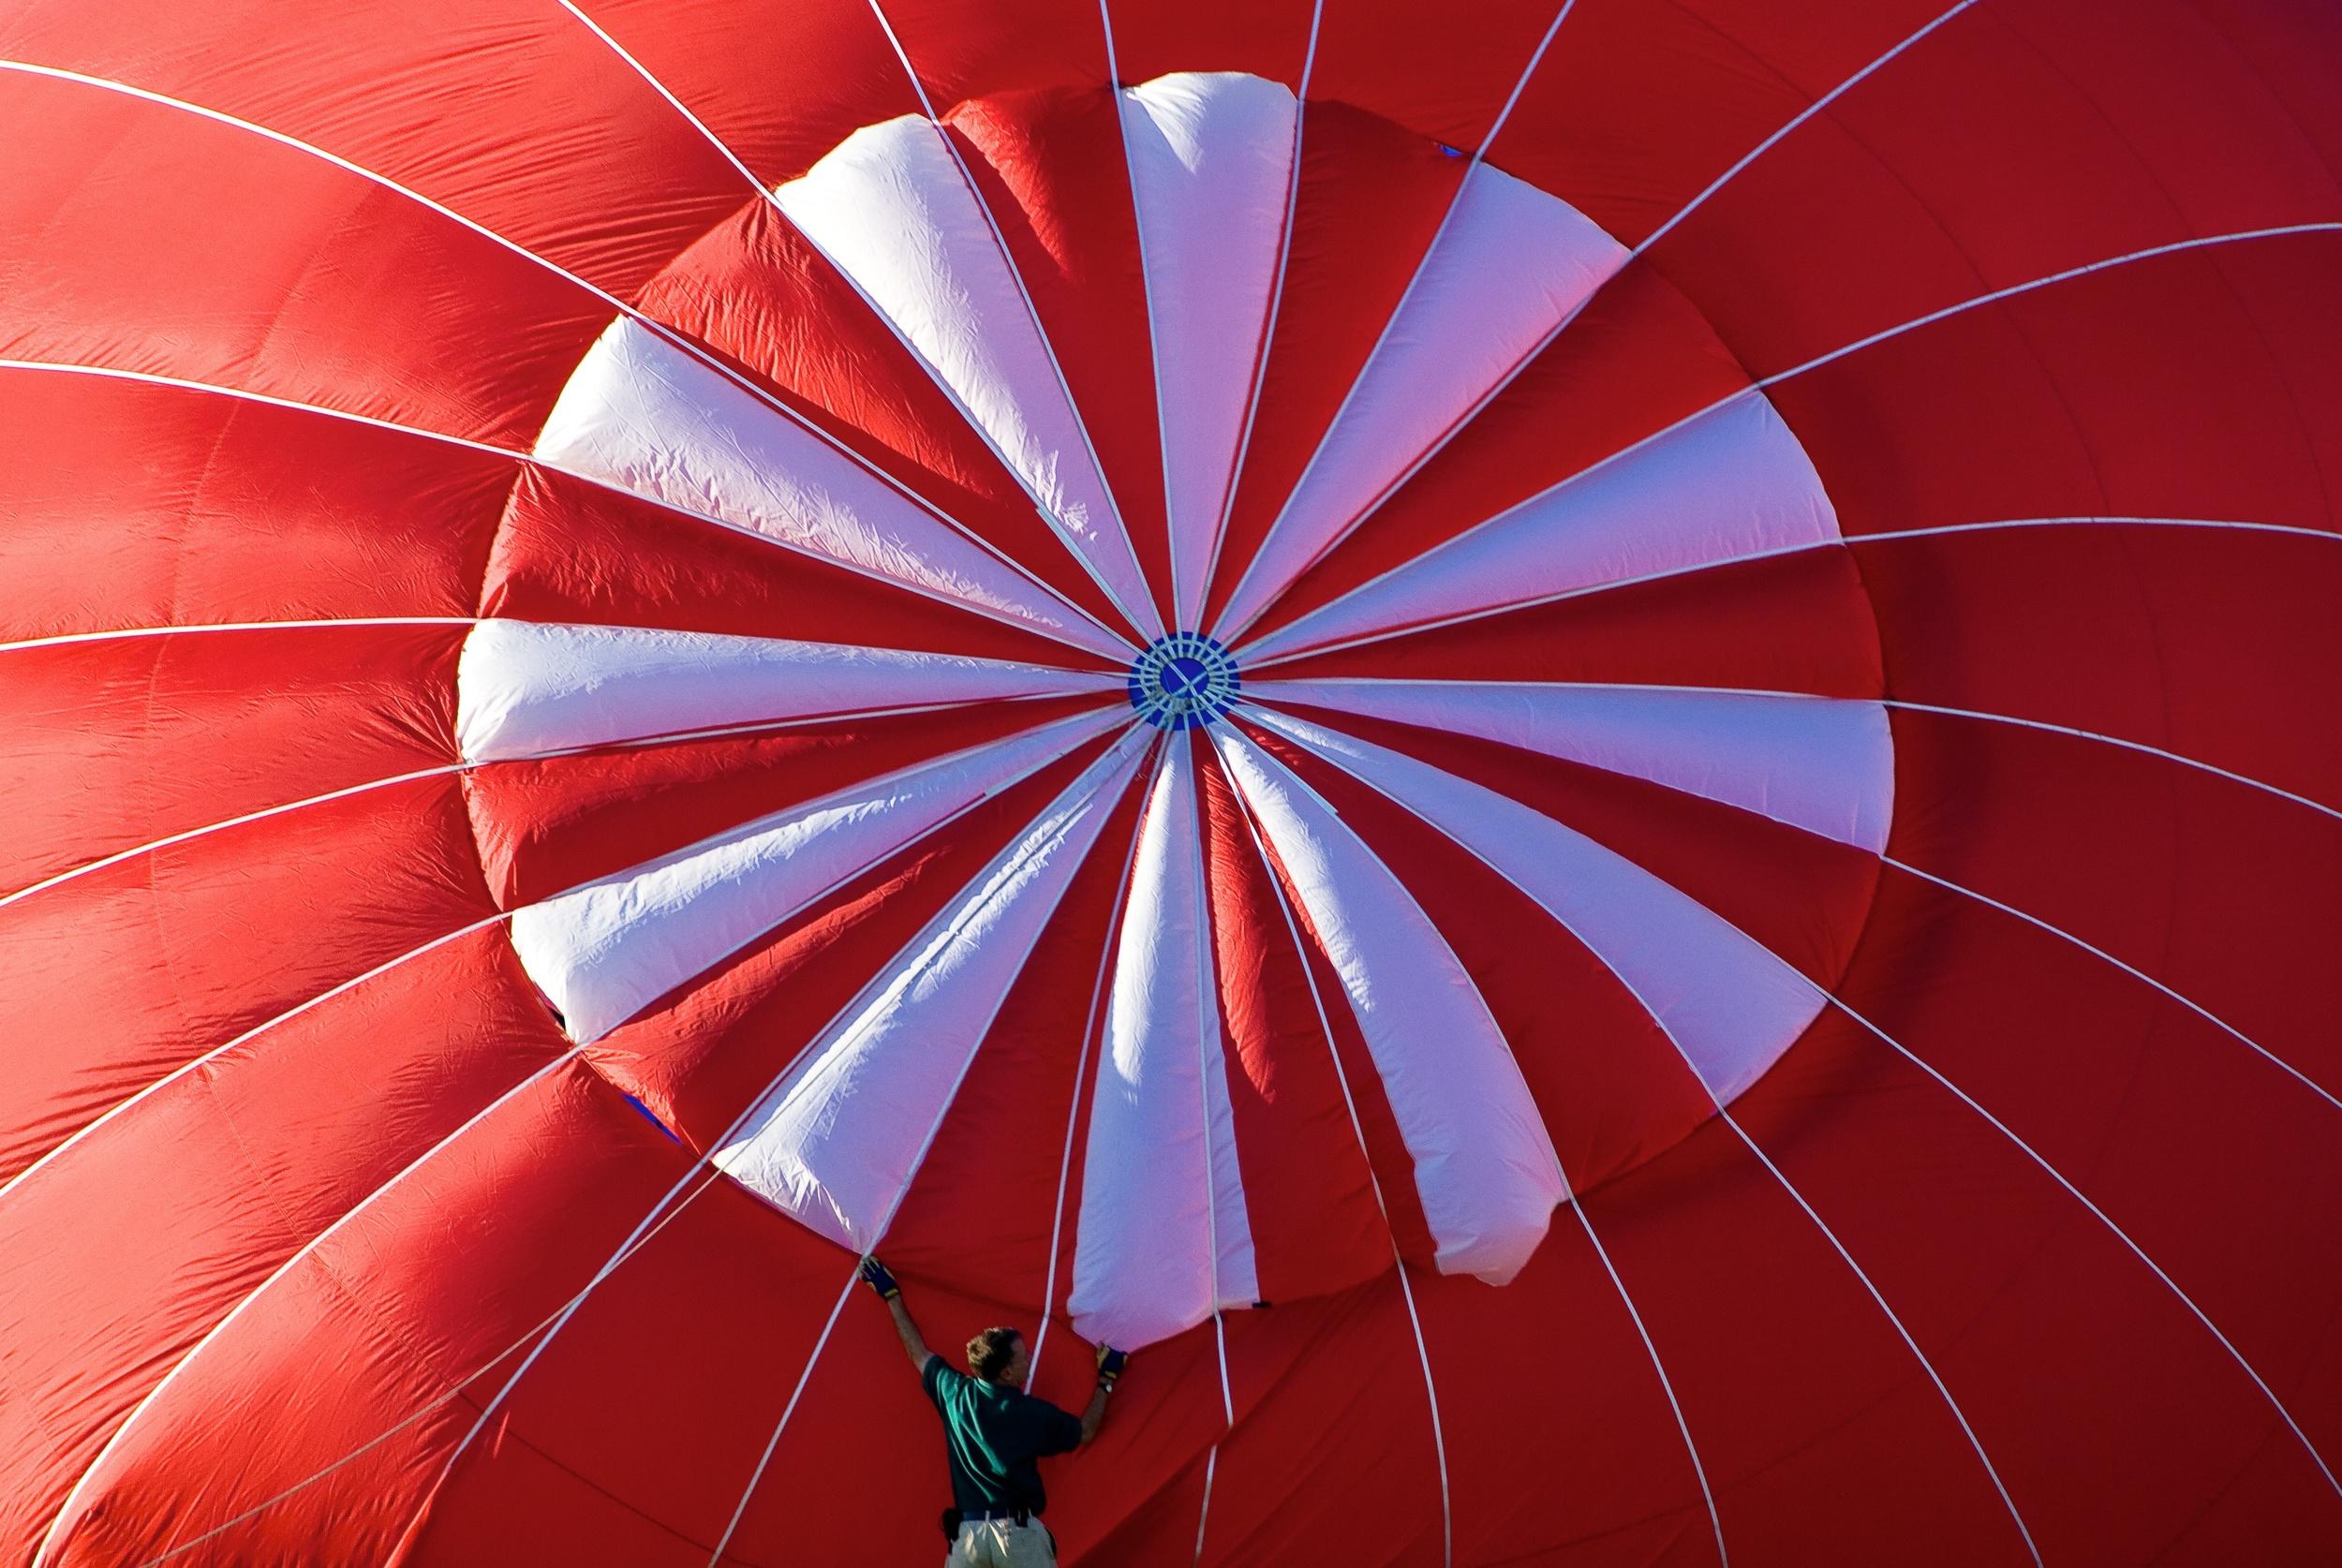 99 Foot Red Balloon.jpg